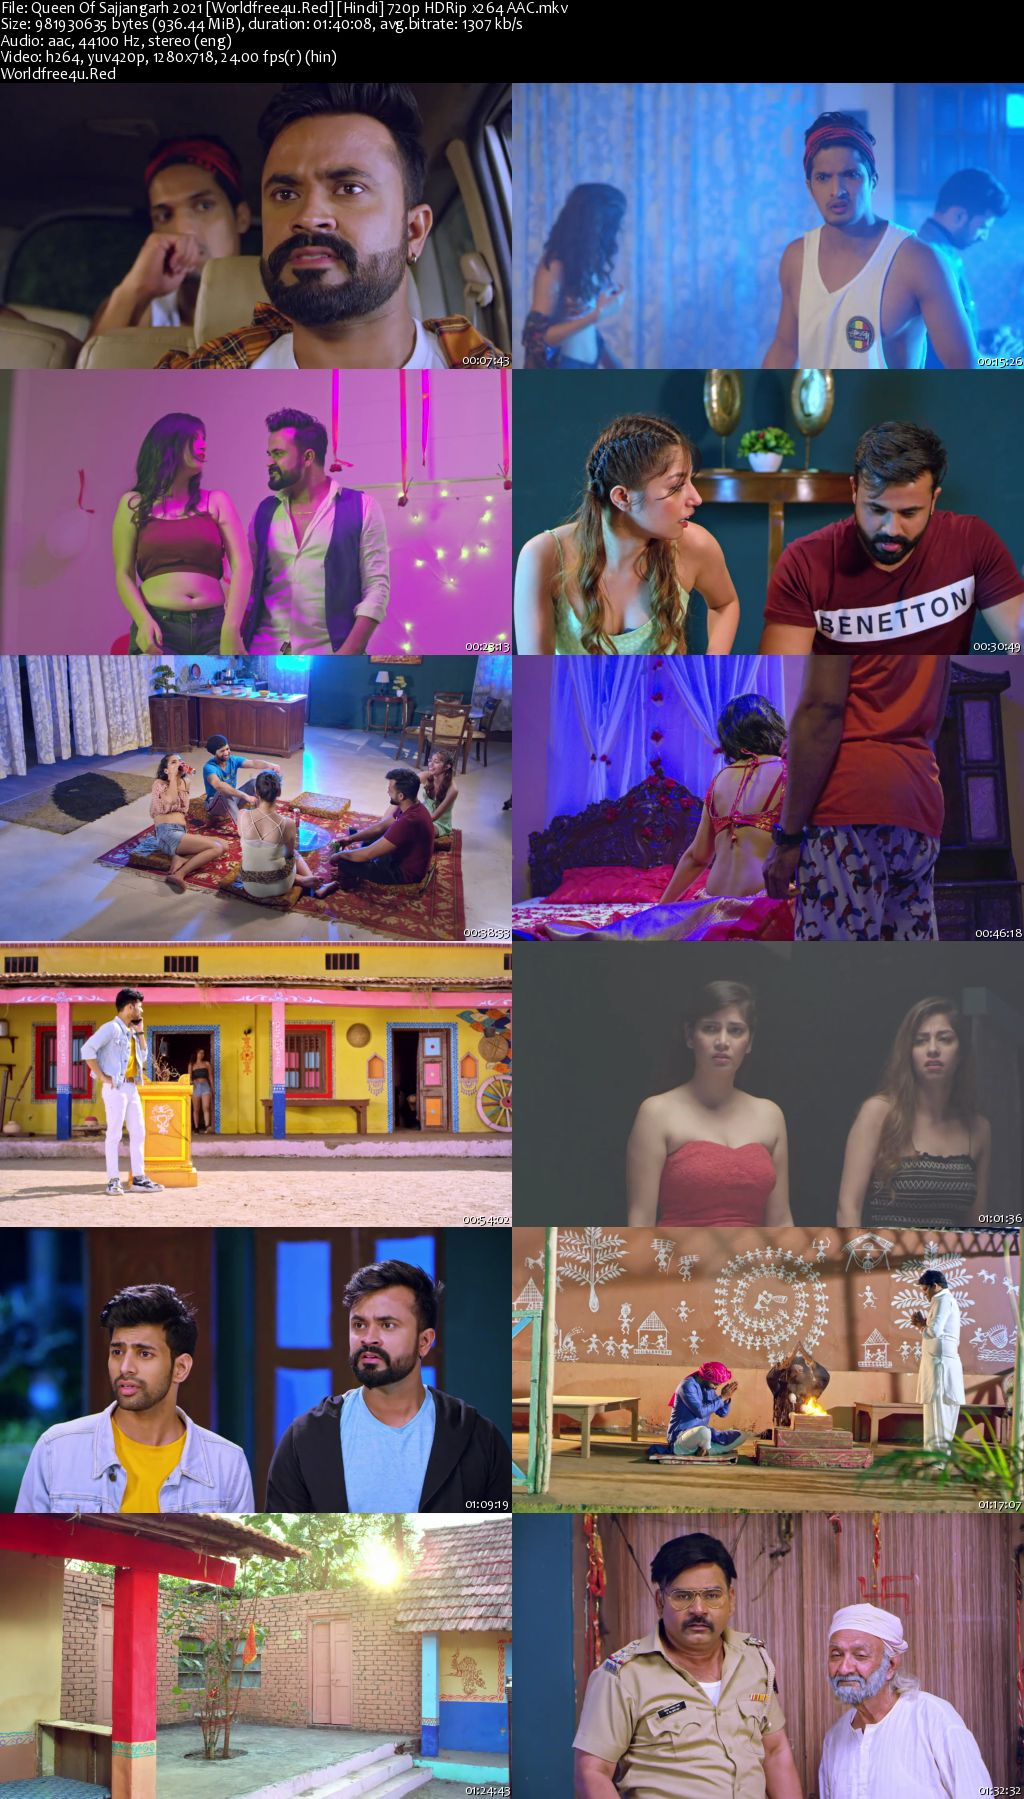 Queen Of Sajjangarh 2021 Hindi HDRip 720p